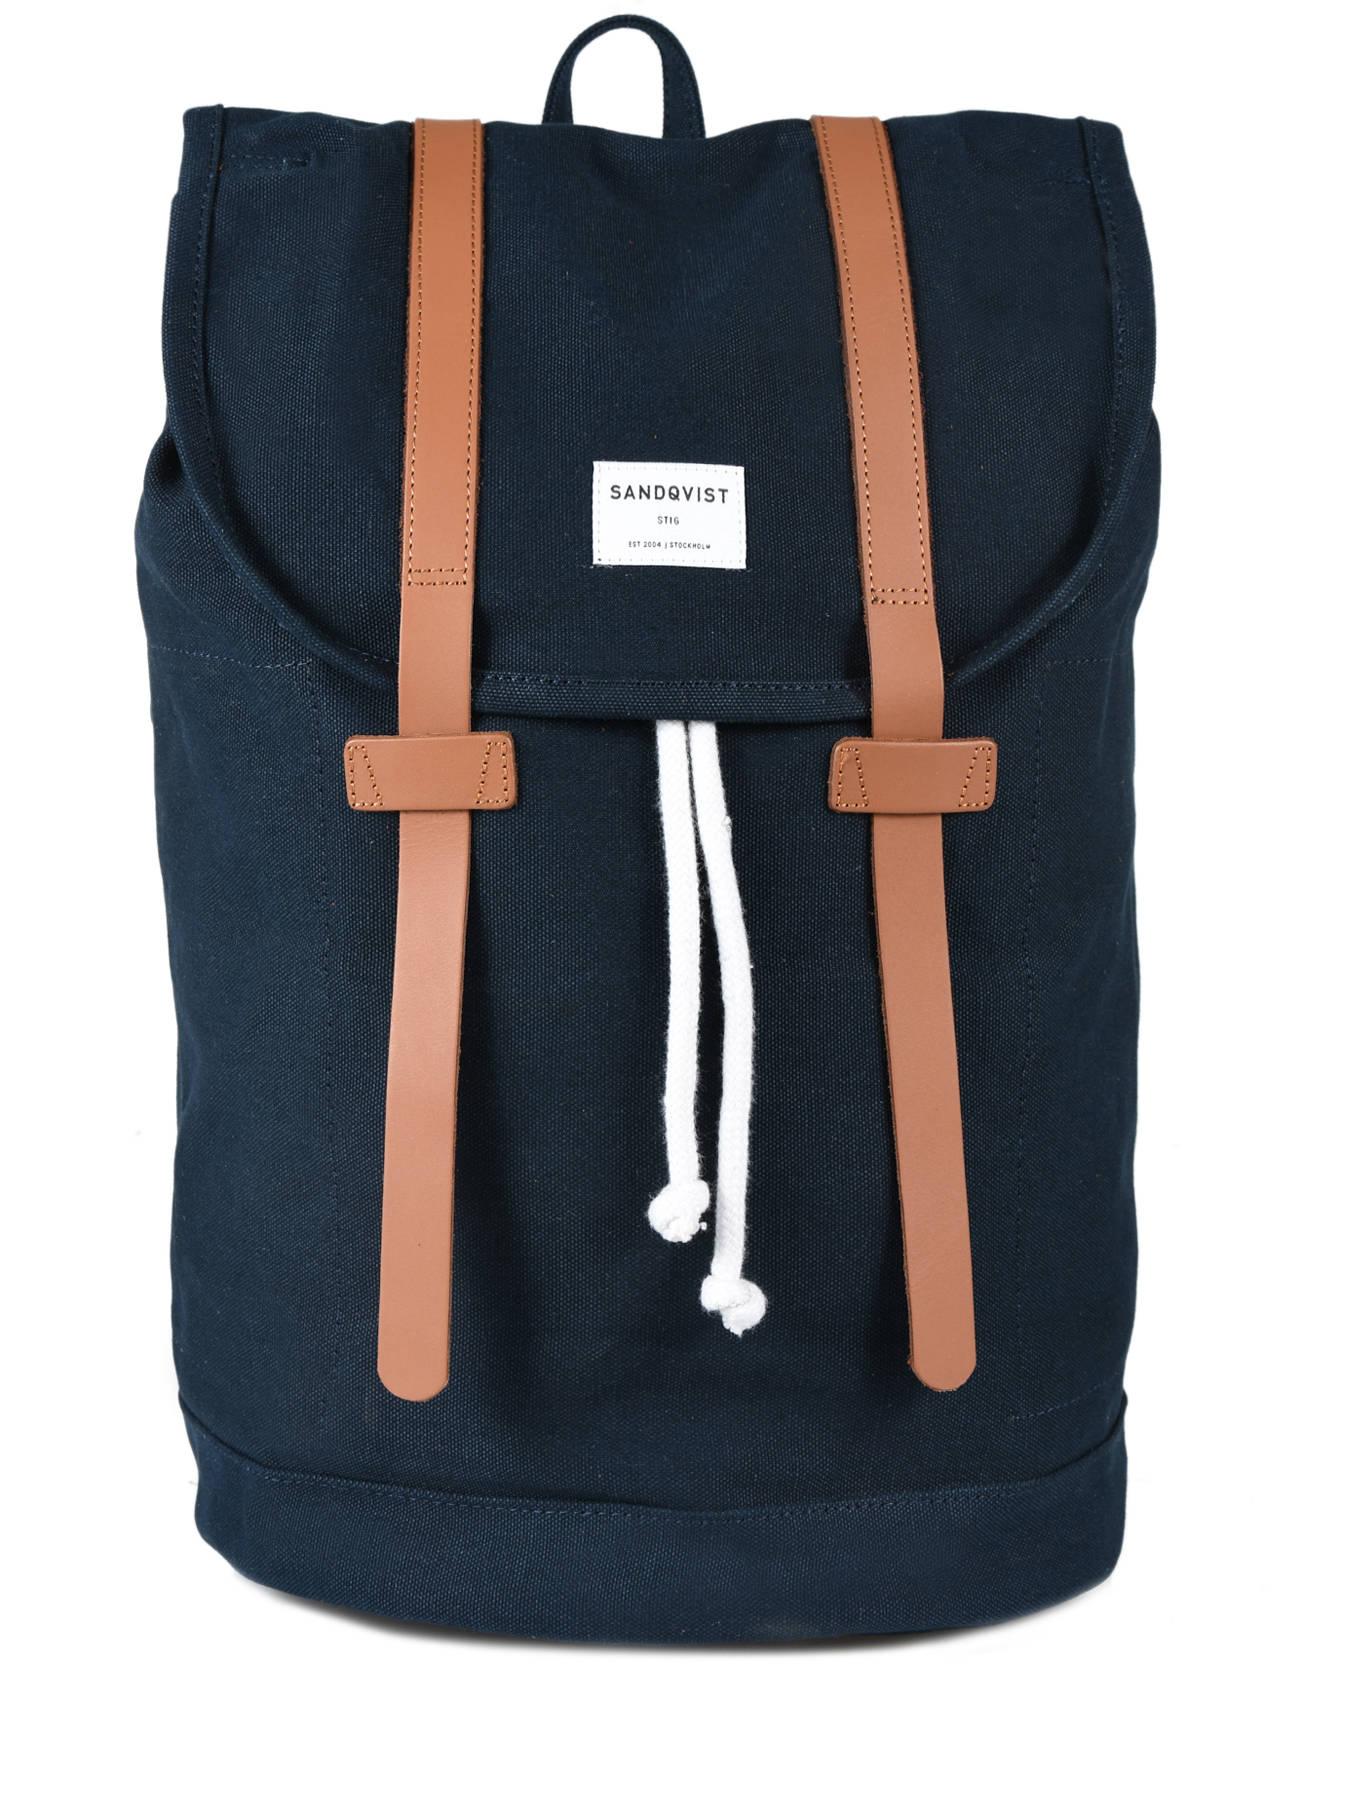 ... Backpack Stig Large A4 + 15   Pc Sandqvist Blue stig STIG-L ... 7bc02c5839